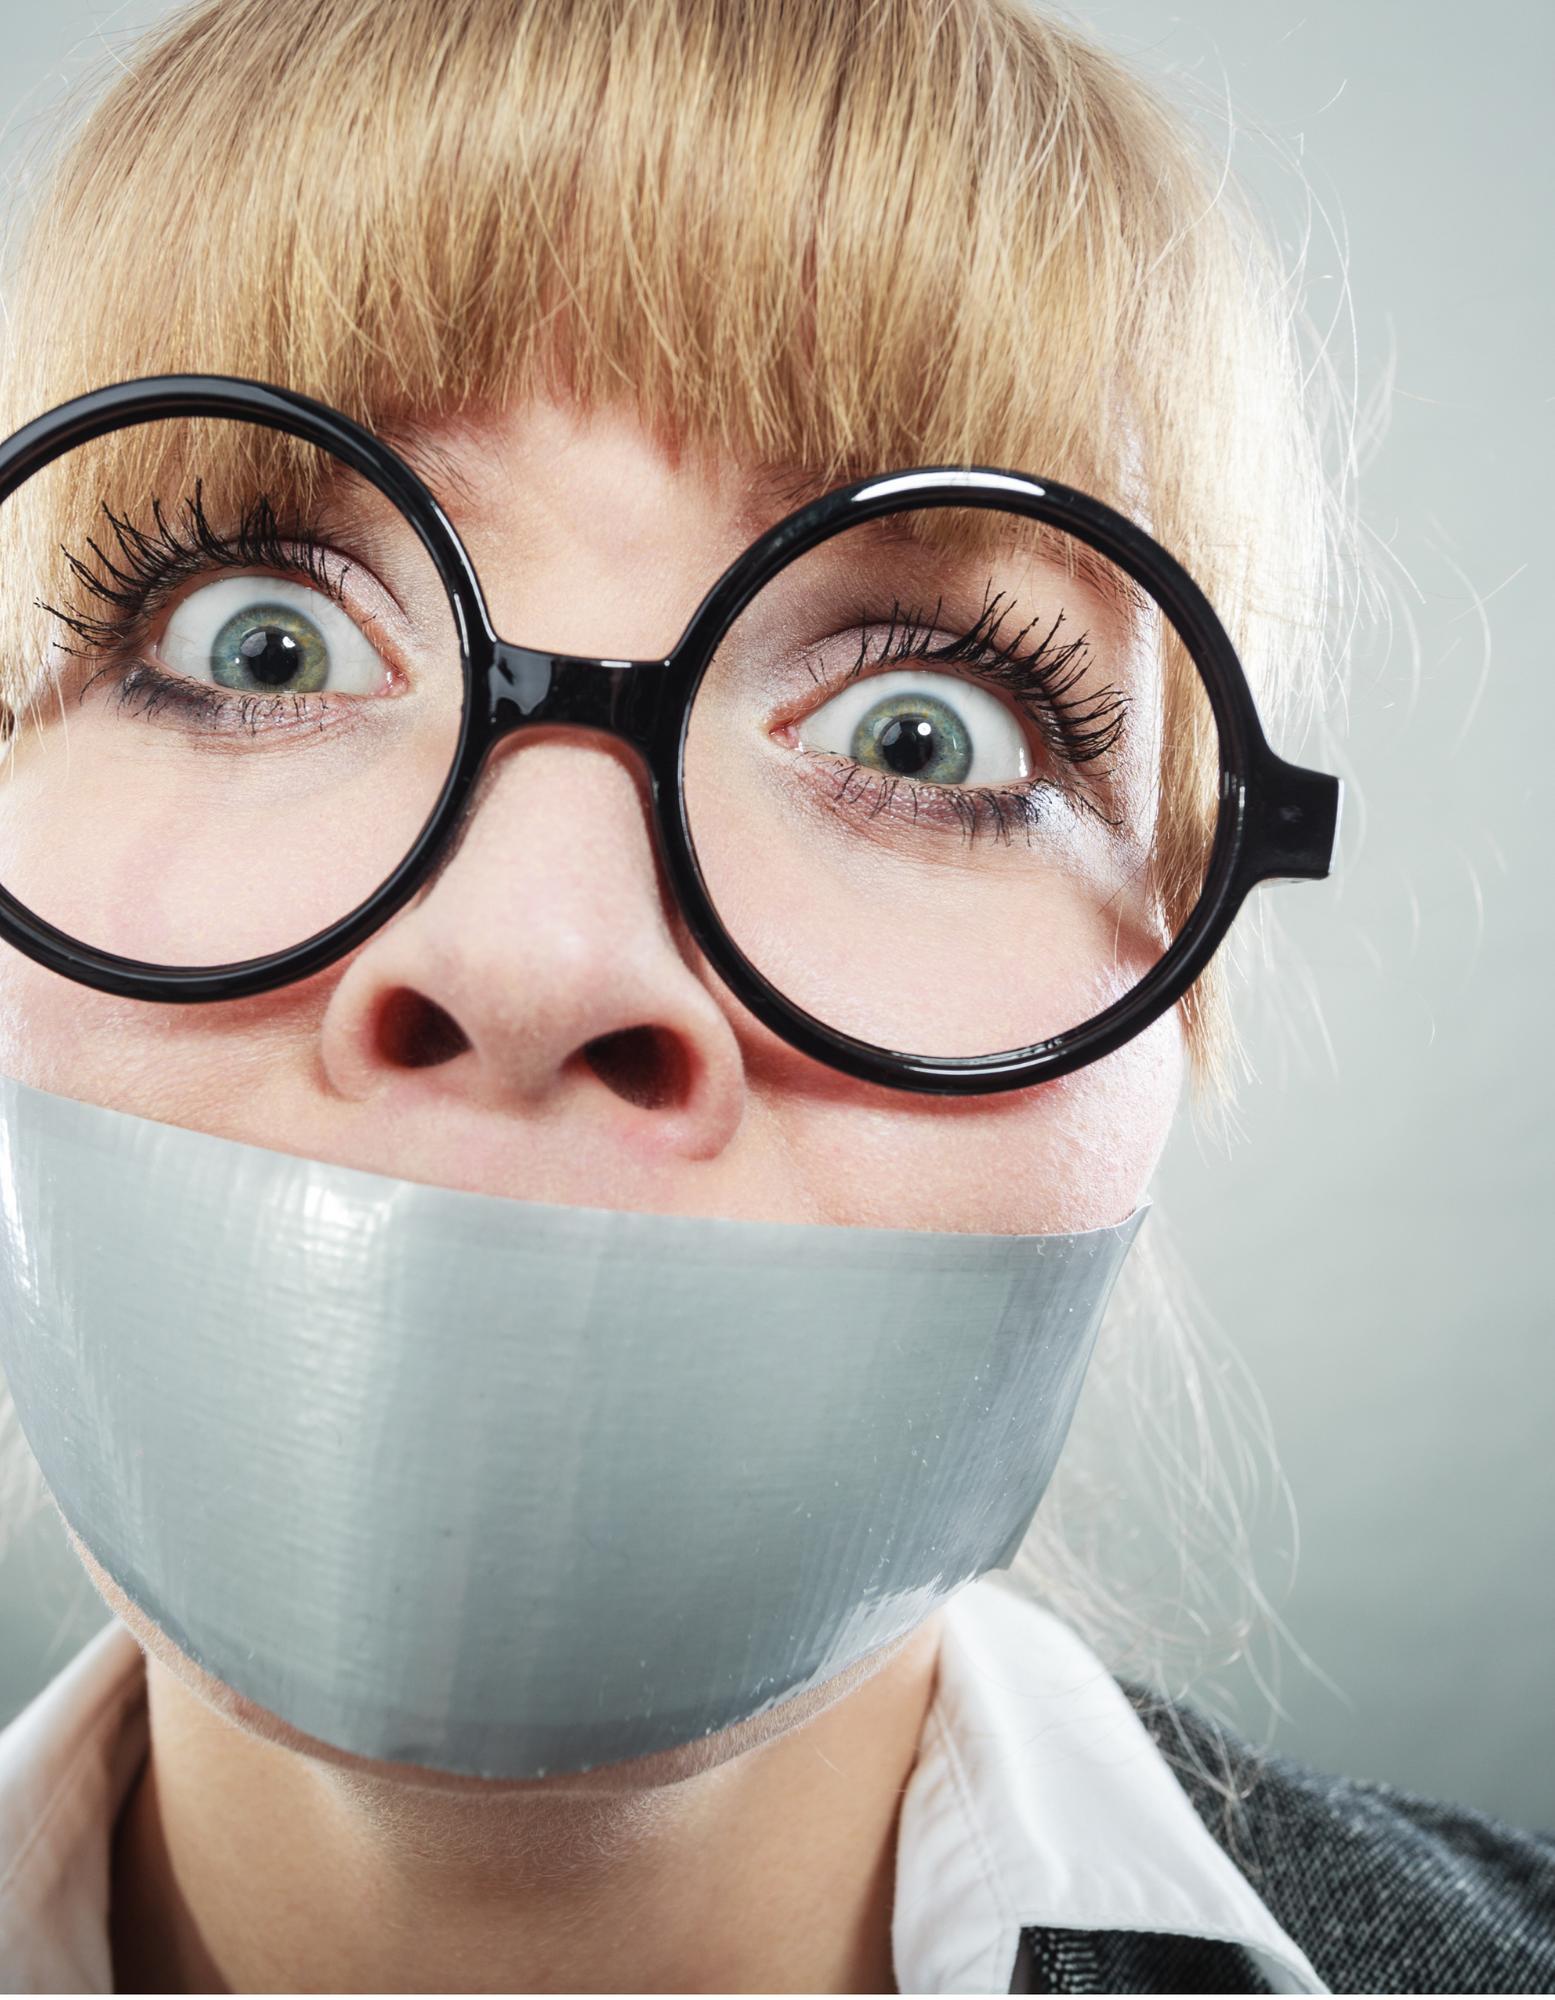 Sensitivity Readers Vs. Censorship